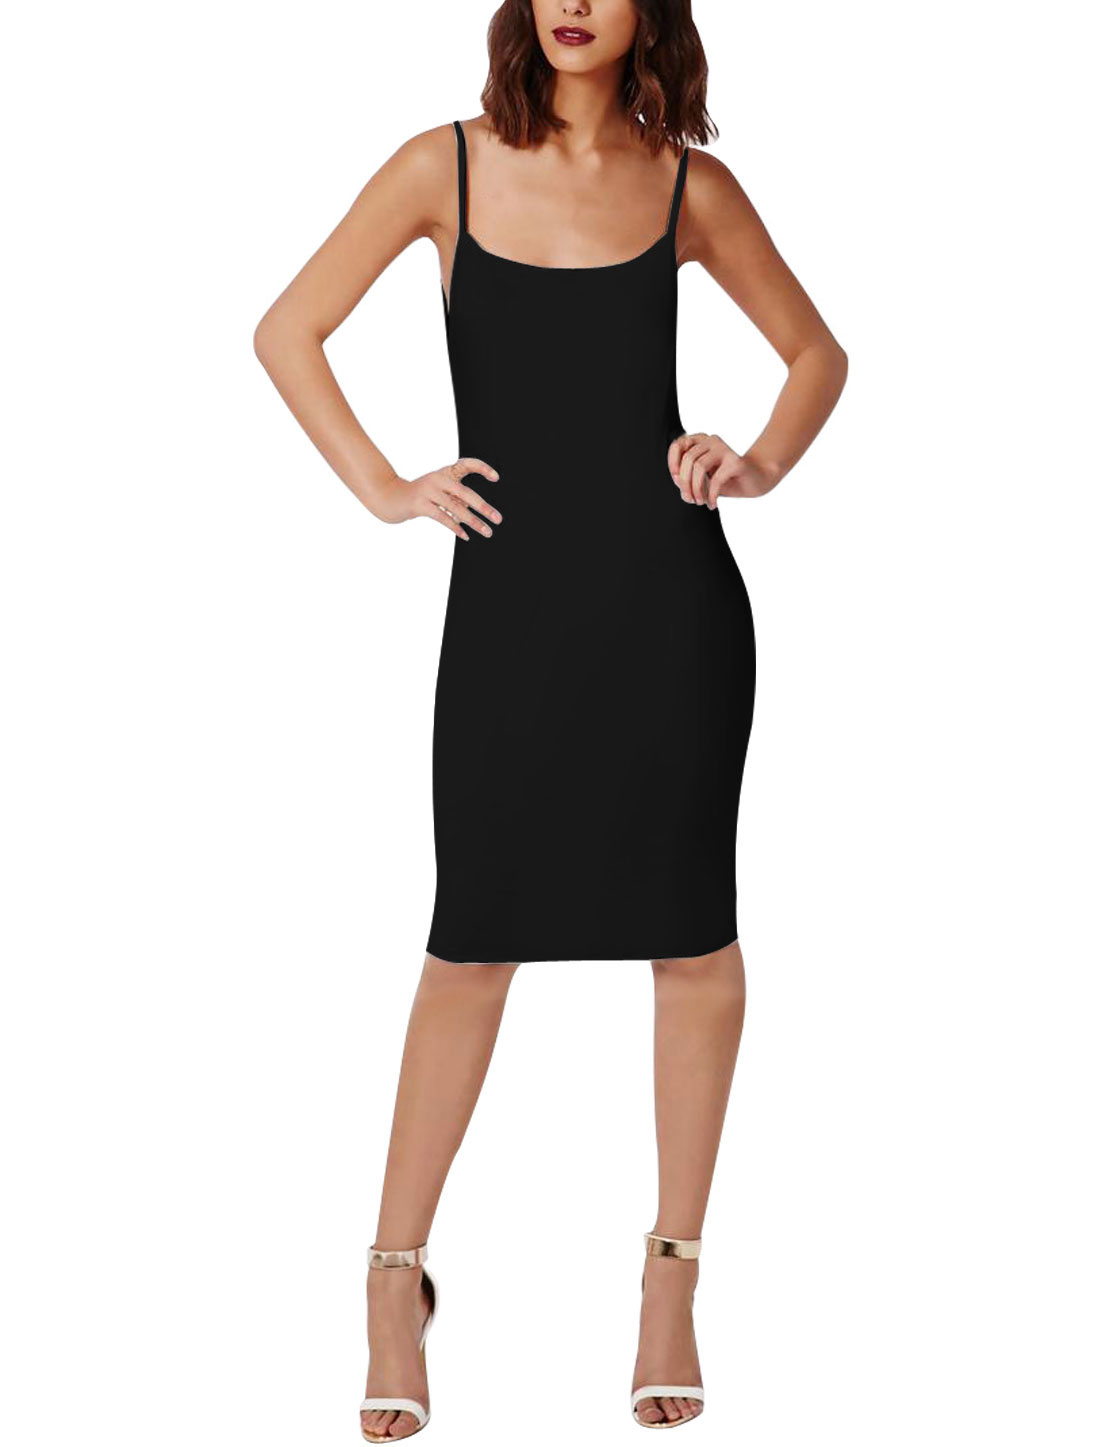 Women Scoop Neck Backless Sleeveless Bodycon Dress Black L